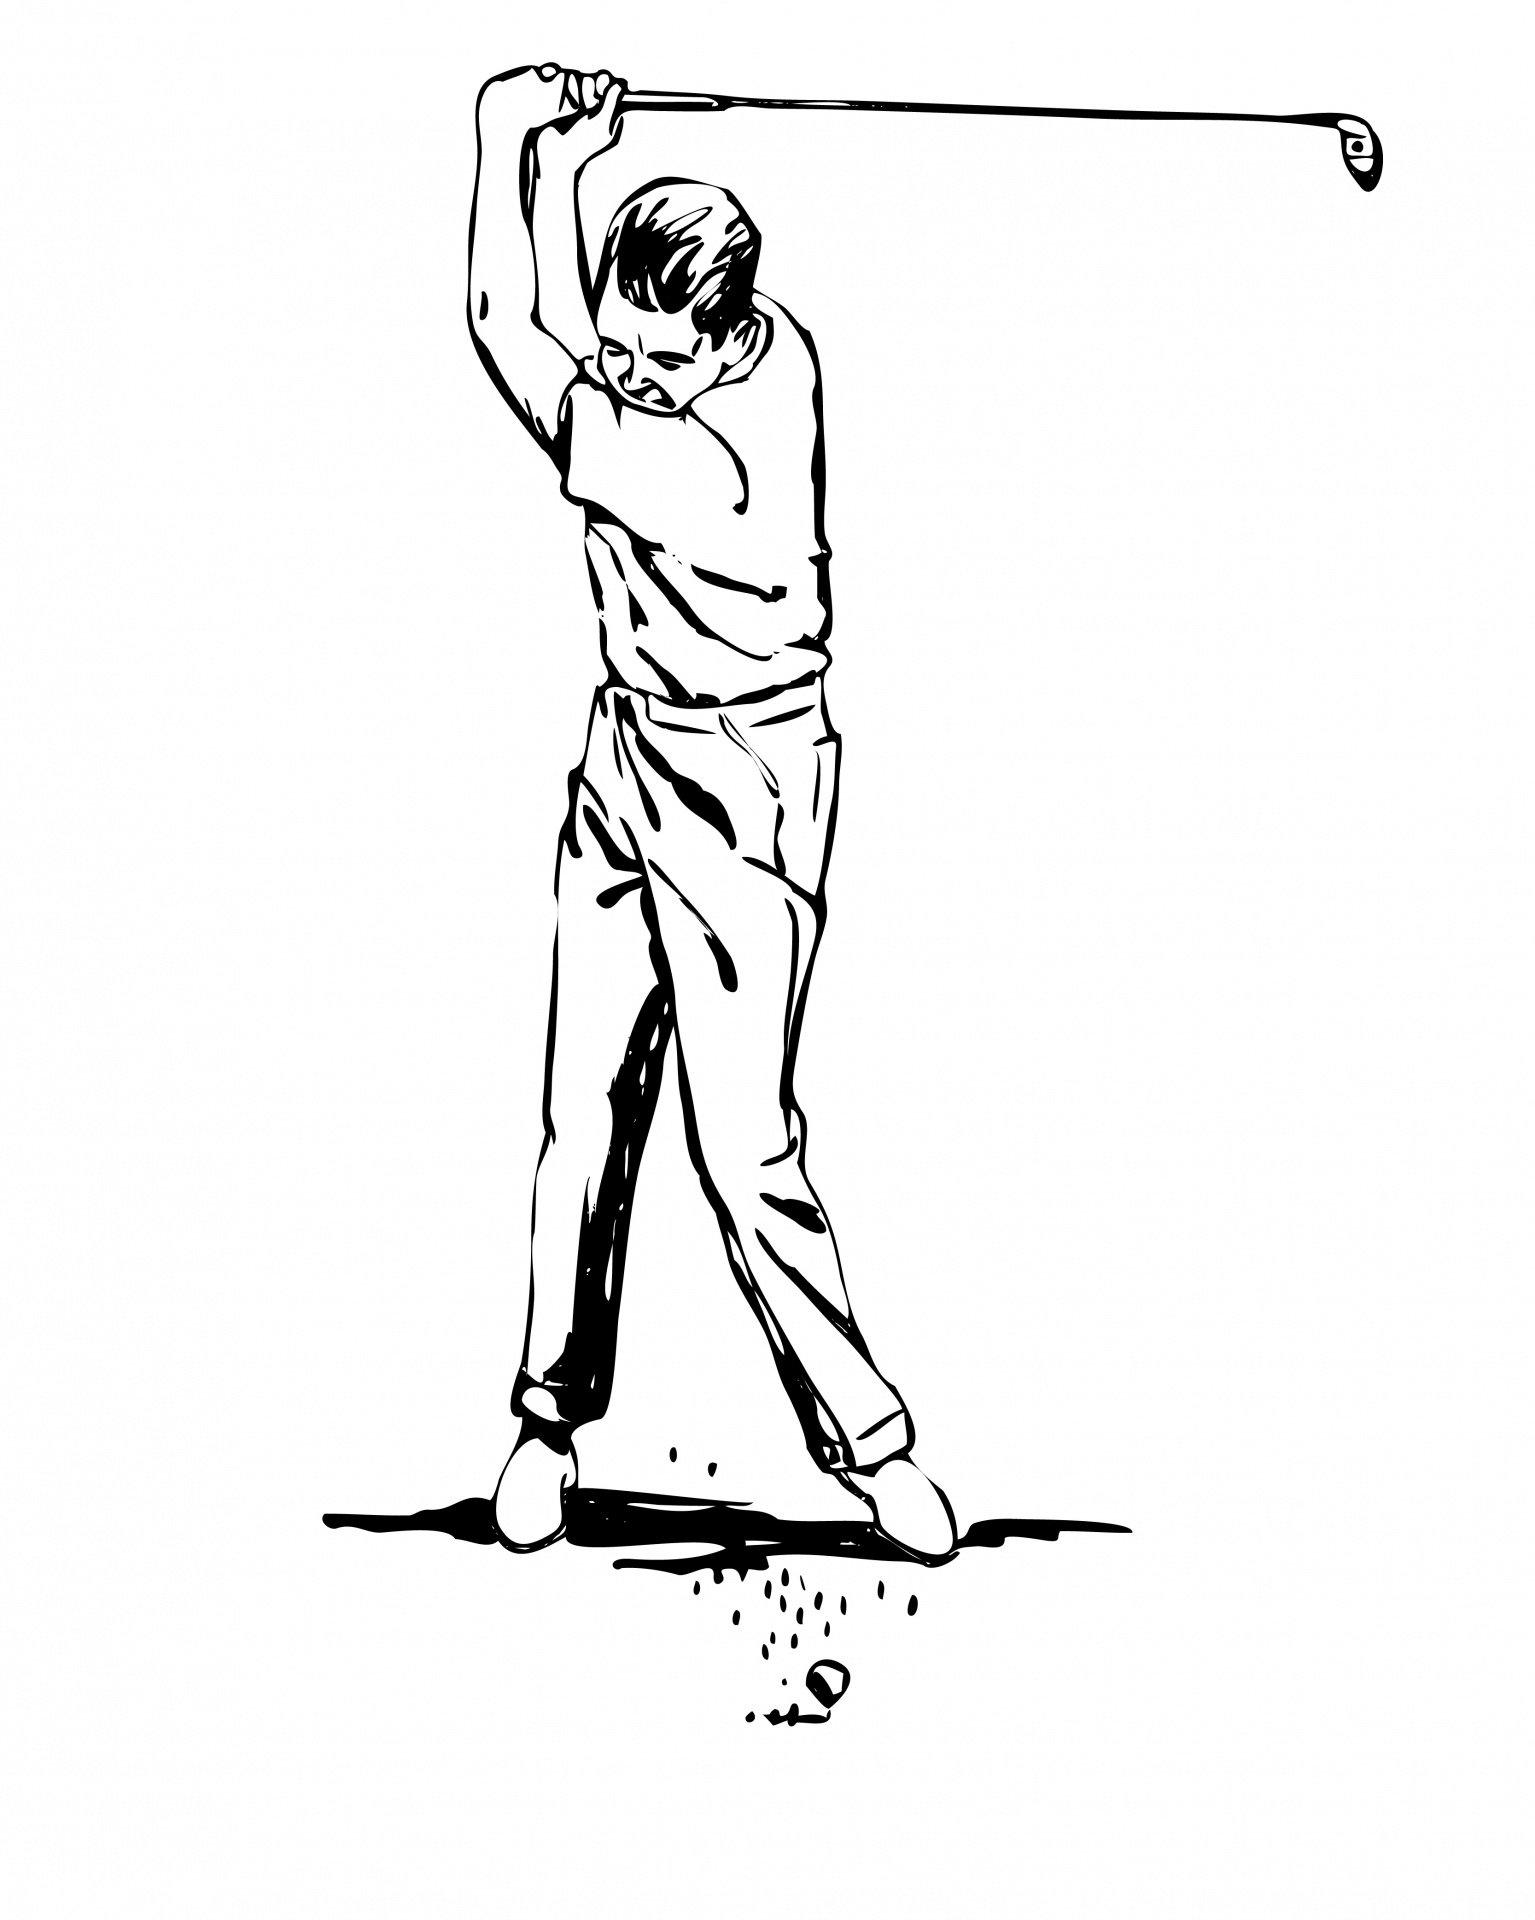 Golfer clipart. Free stock photo public